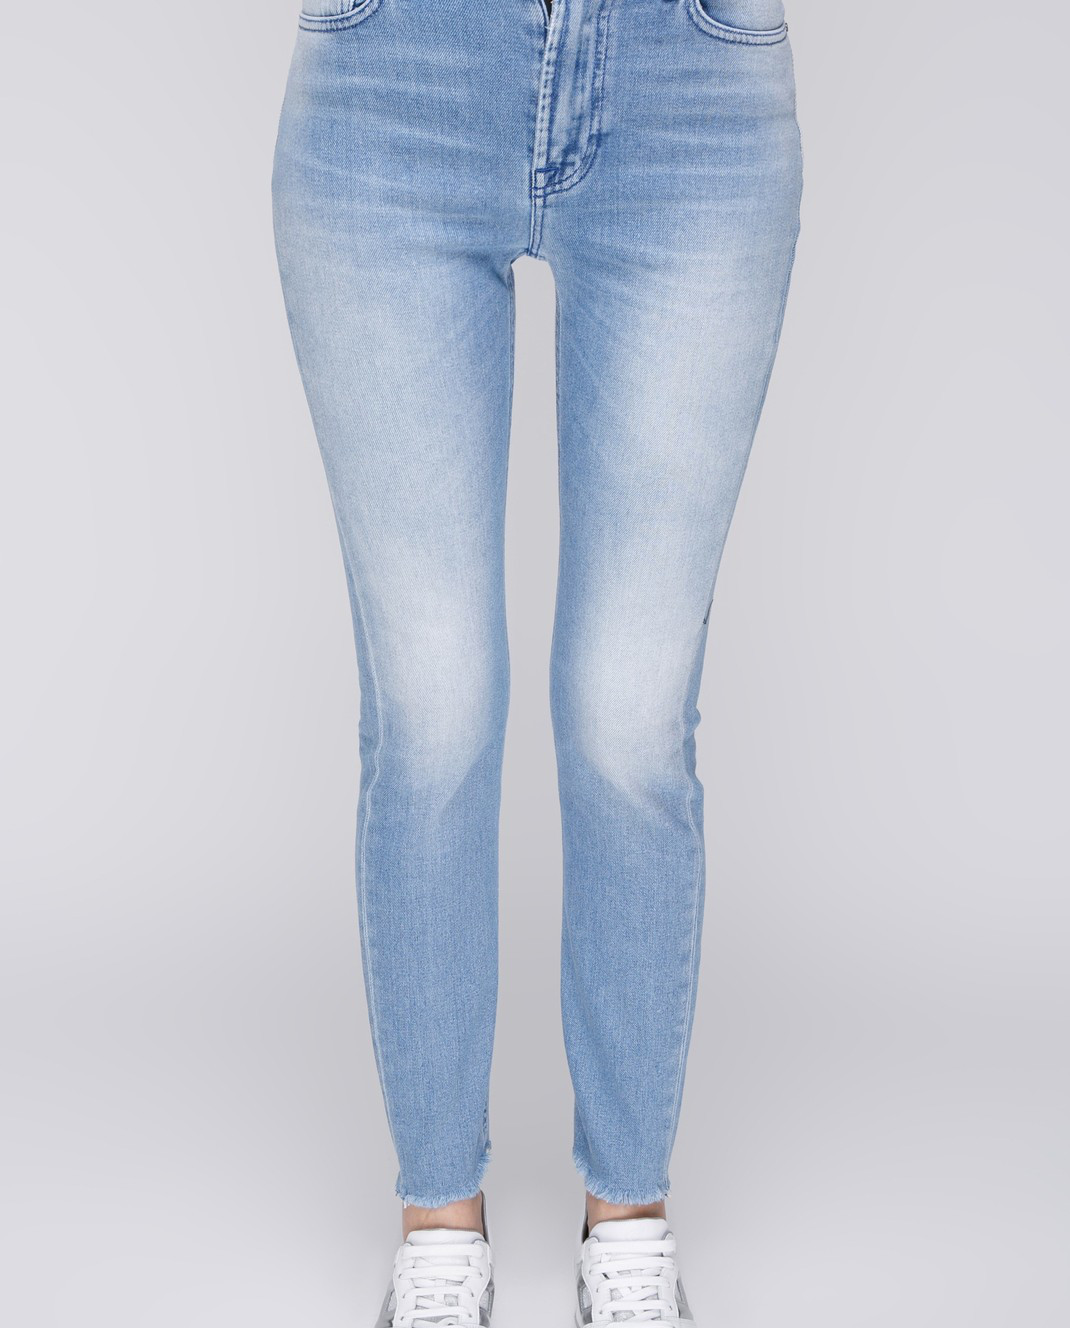 Mr&Mrs Italy Голубые джинсы JE040 изображение 3